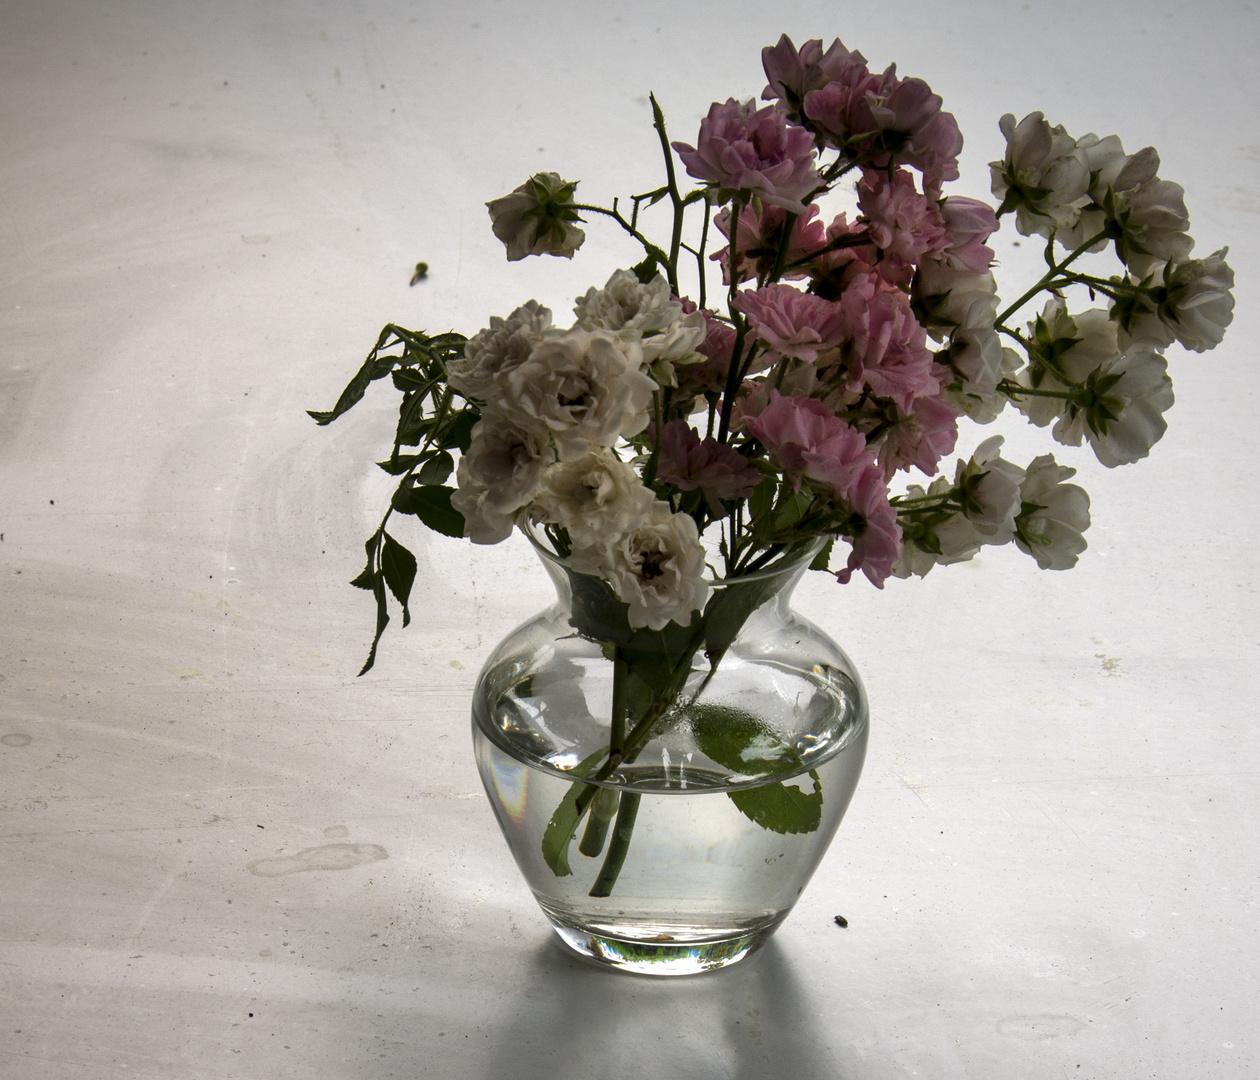 Gerro amb roses petites